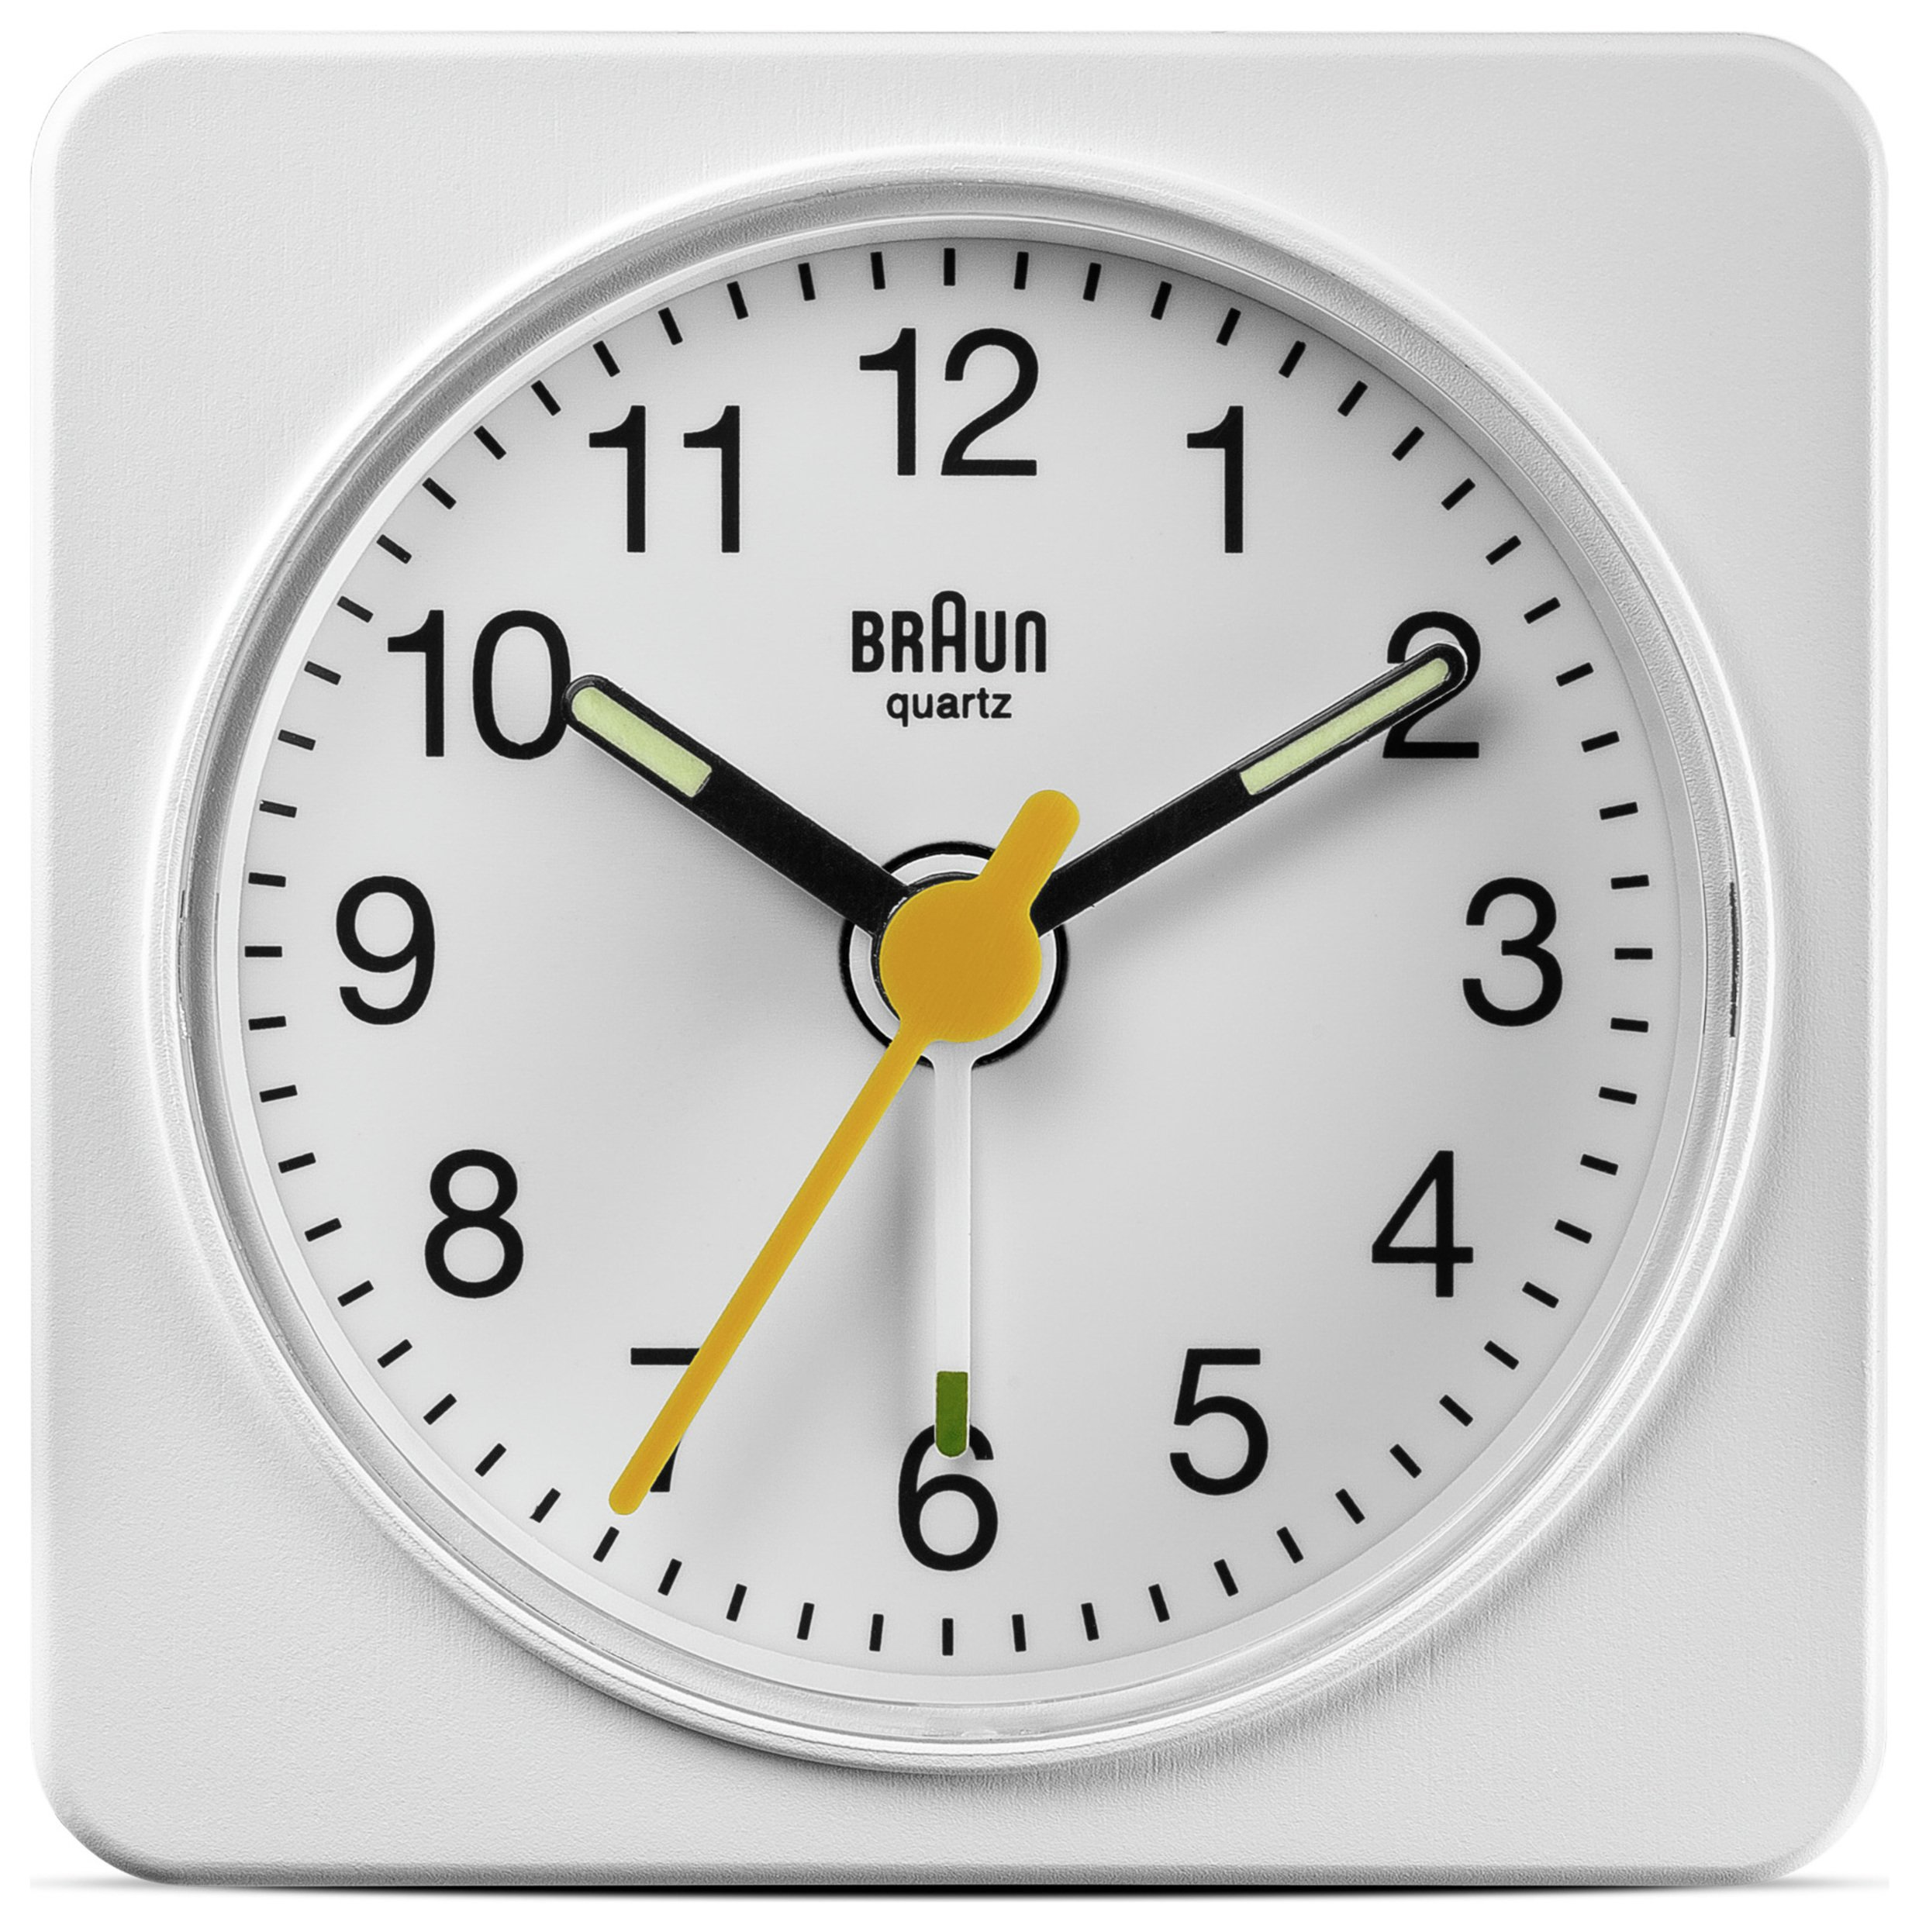 Braun Travel Alarm Clock - White